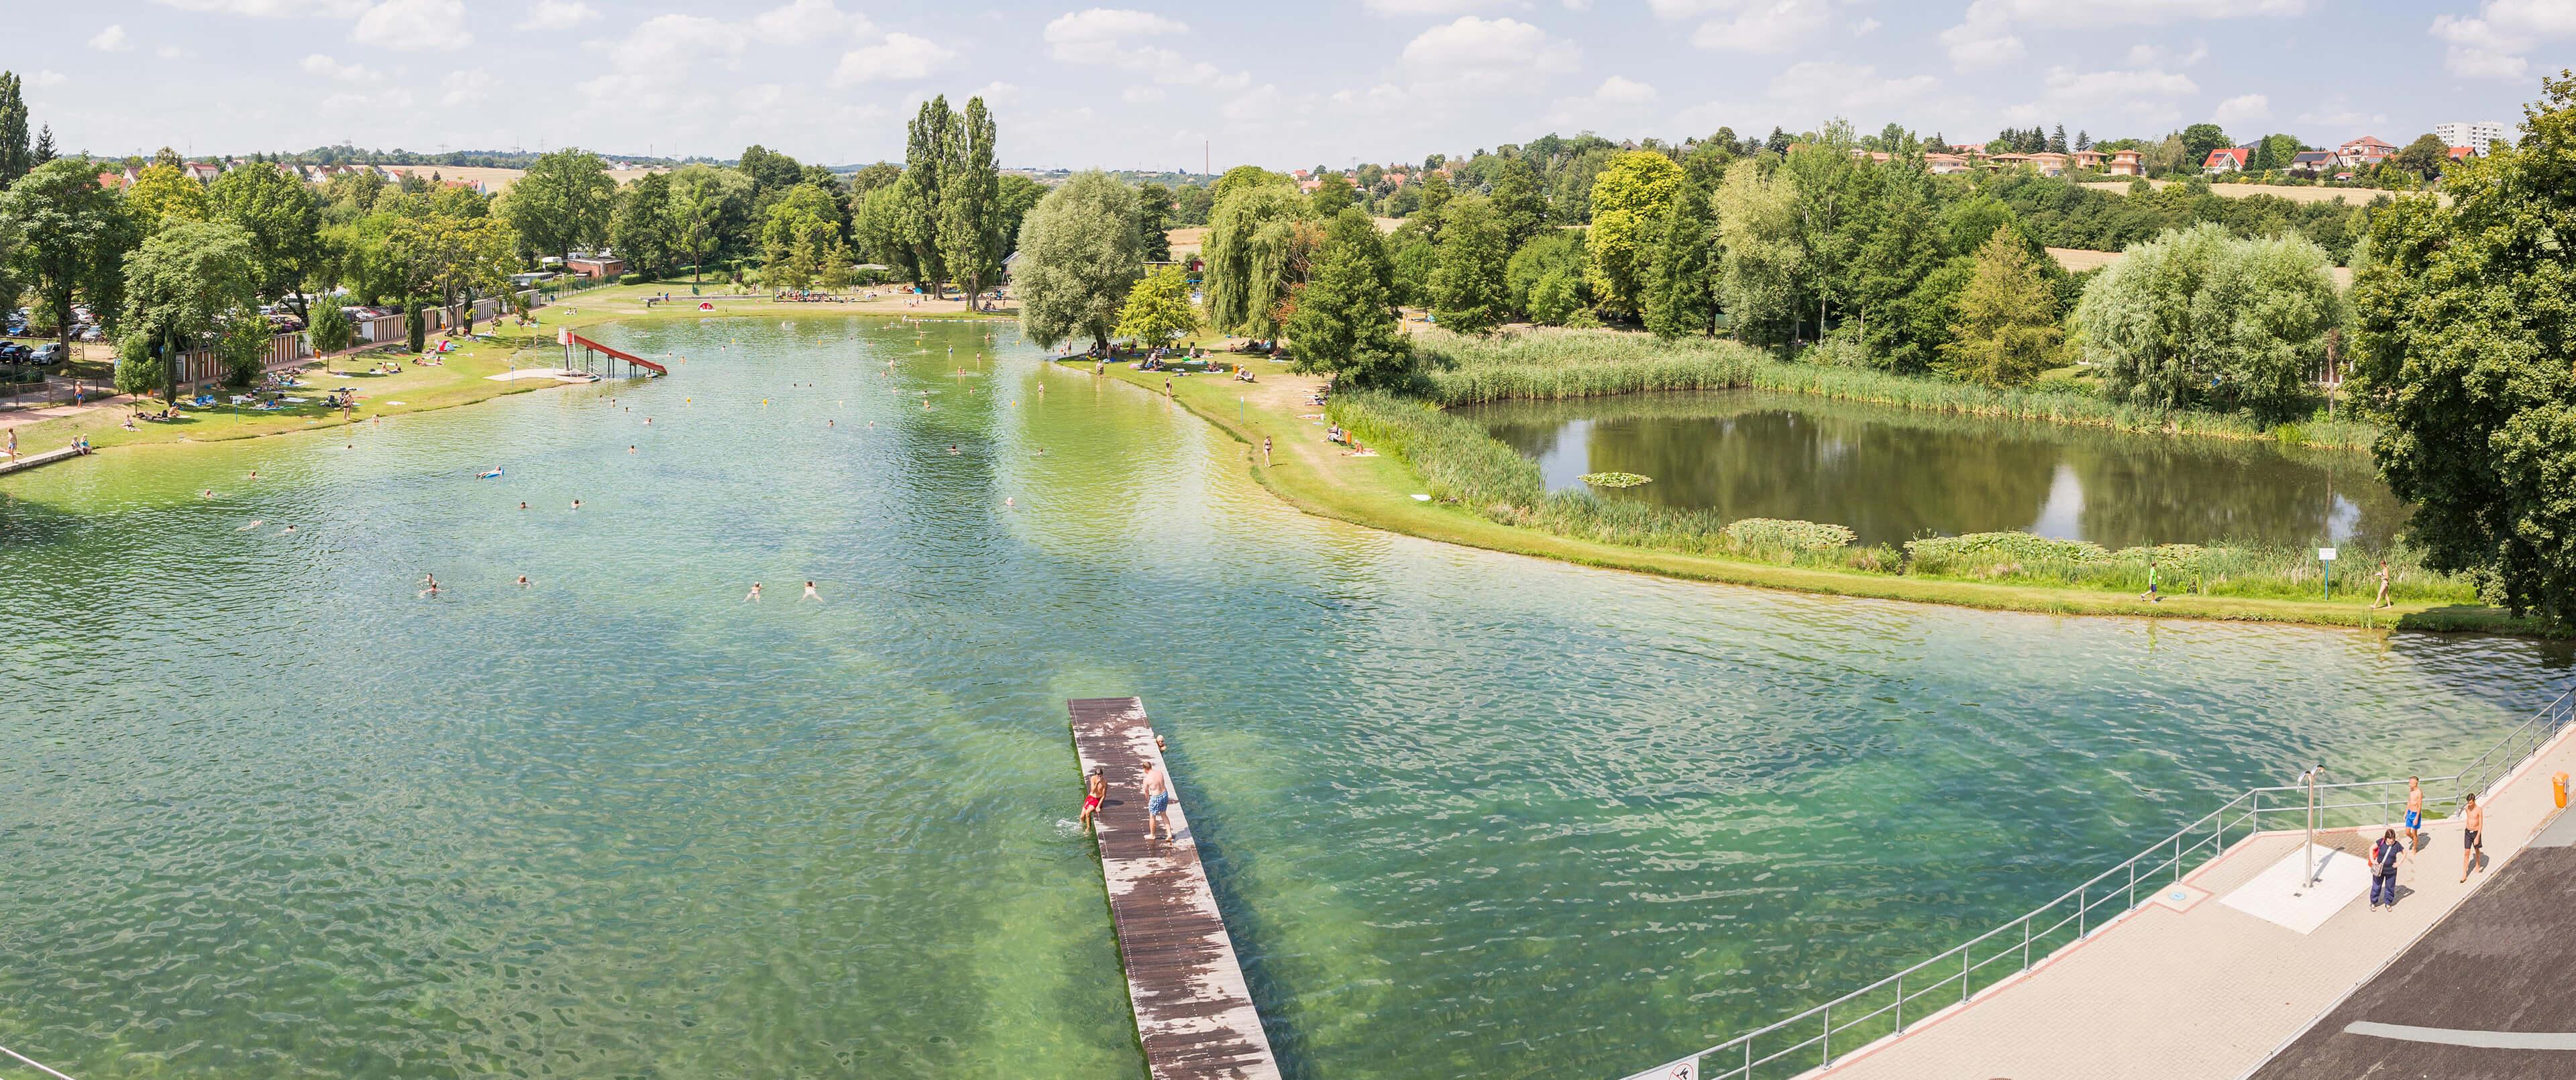 Naturbad Mockritz